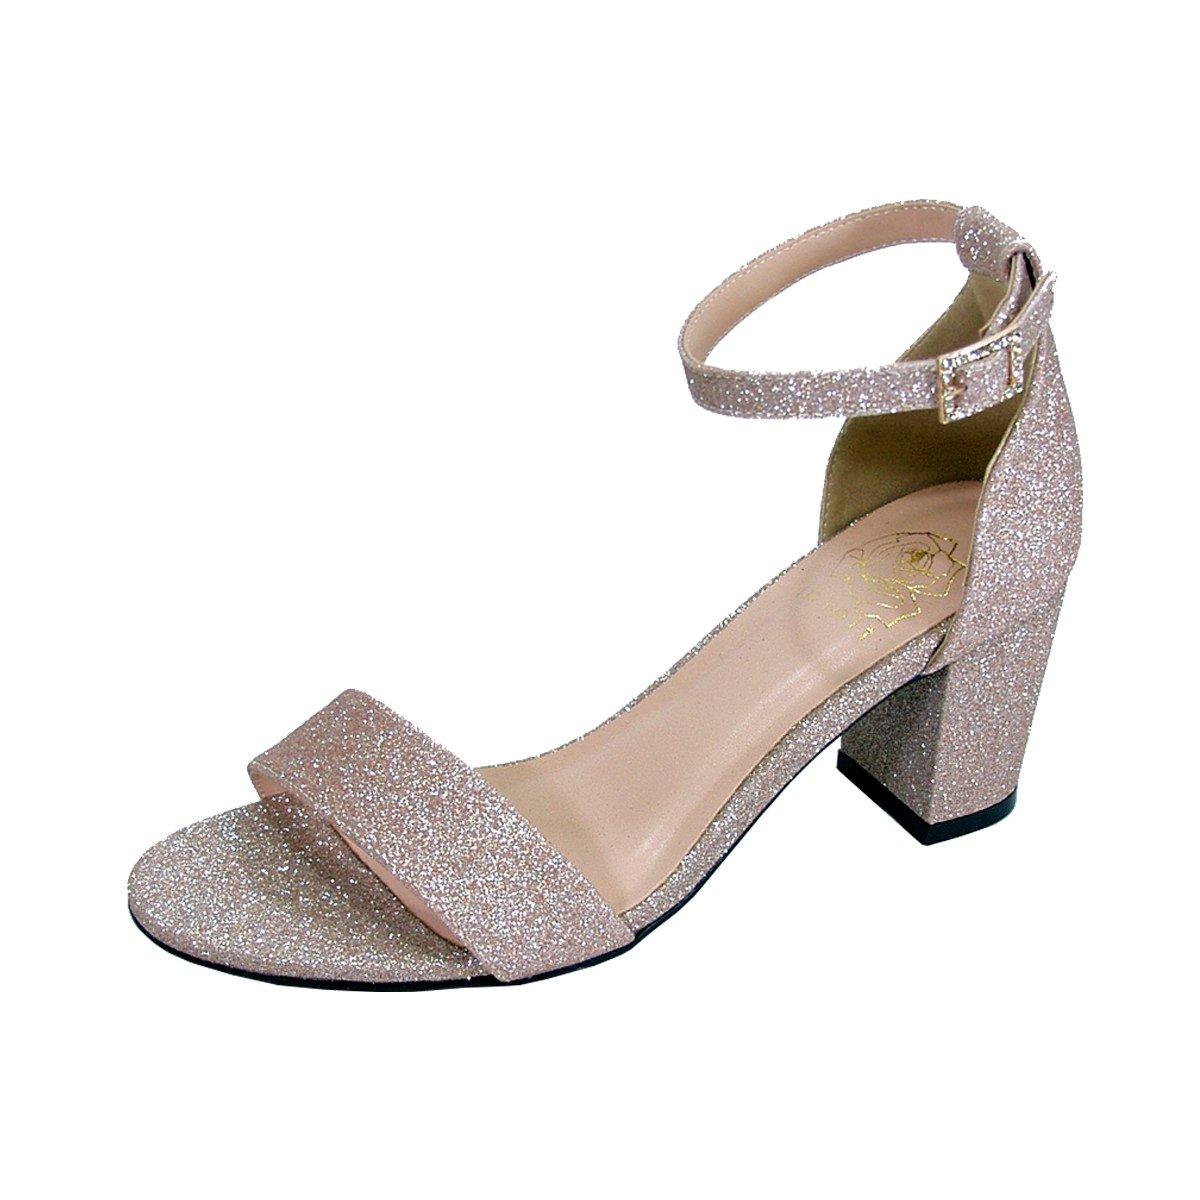 Women's Adele  Champagne Glitter Satin Wide Width Block Heel Ankle Strap Dress Sandals - DeluxeAdultCostumes.com